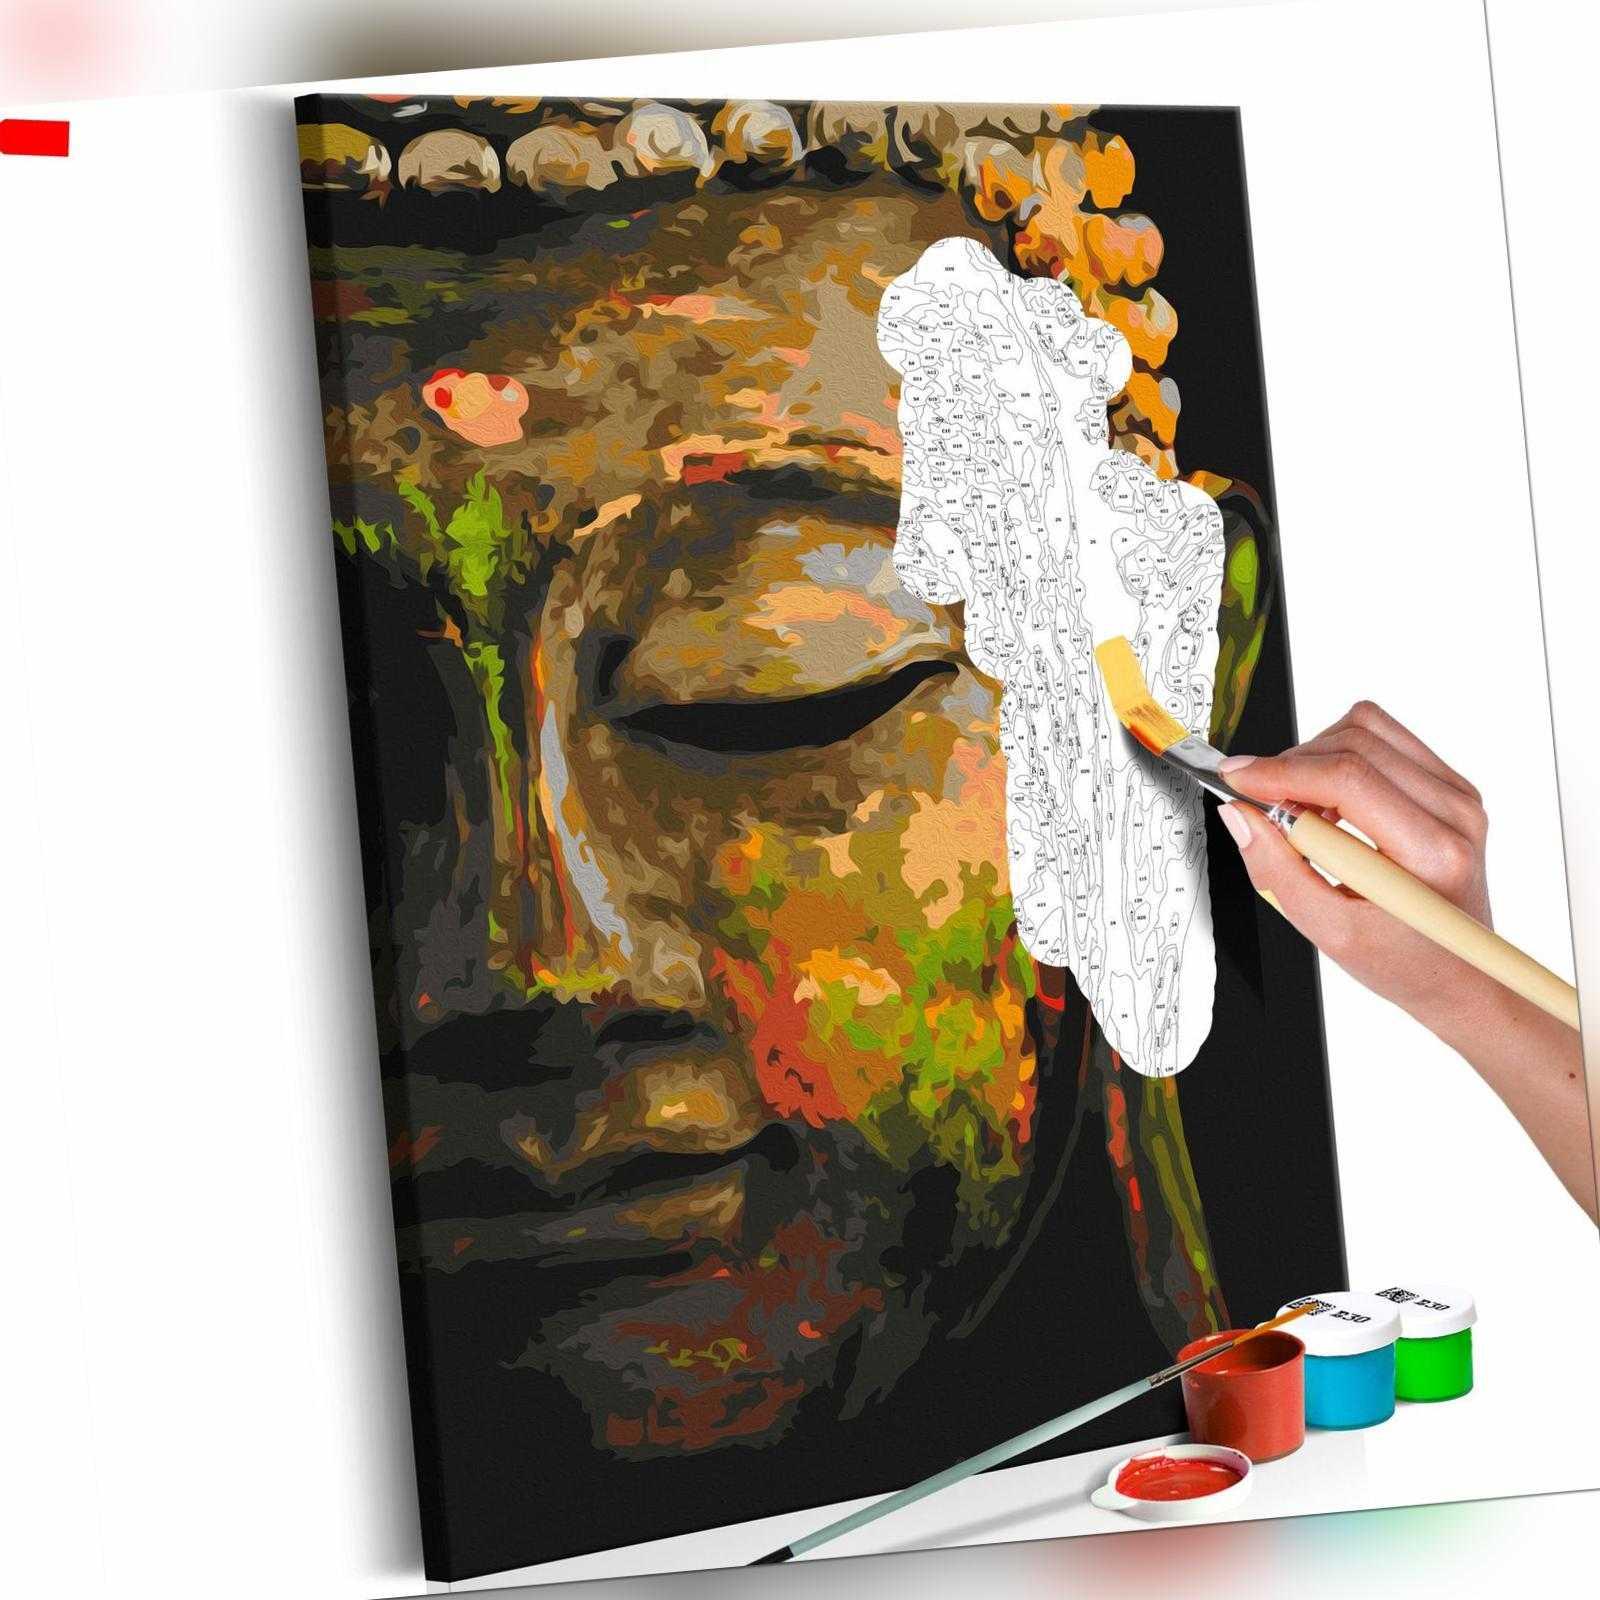 Malset mit Holzrahmen 40x60 Leinwand Erwachsene Gemälde Kit DIY n-A-0568-d-a